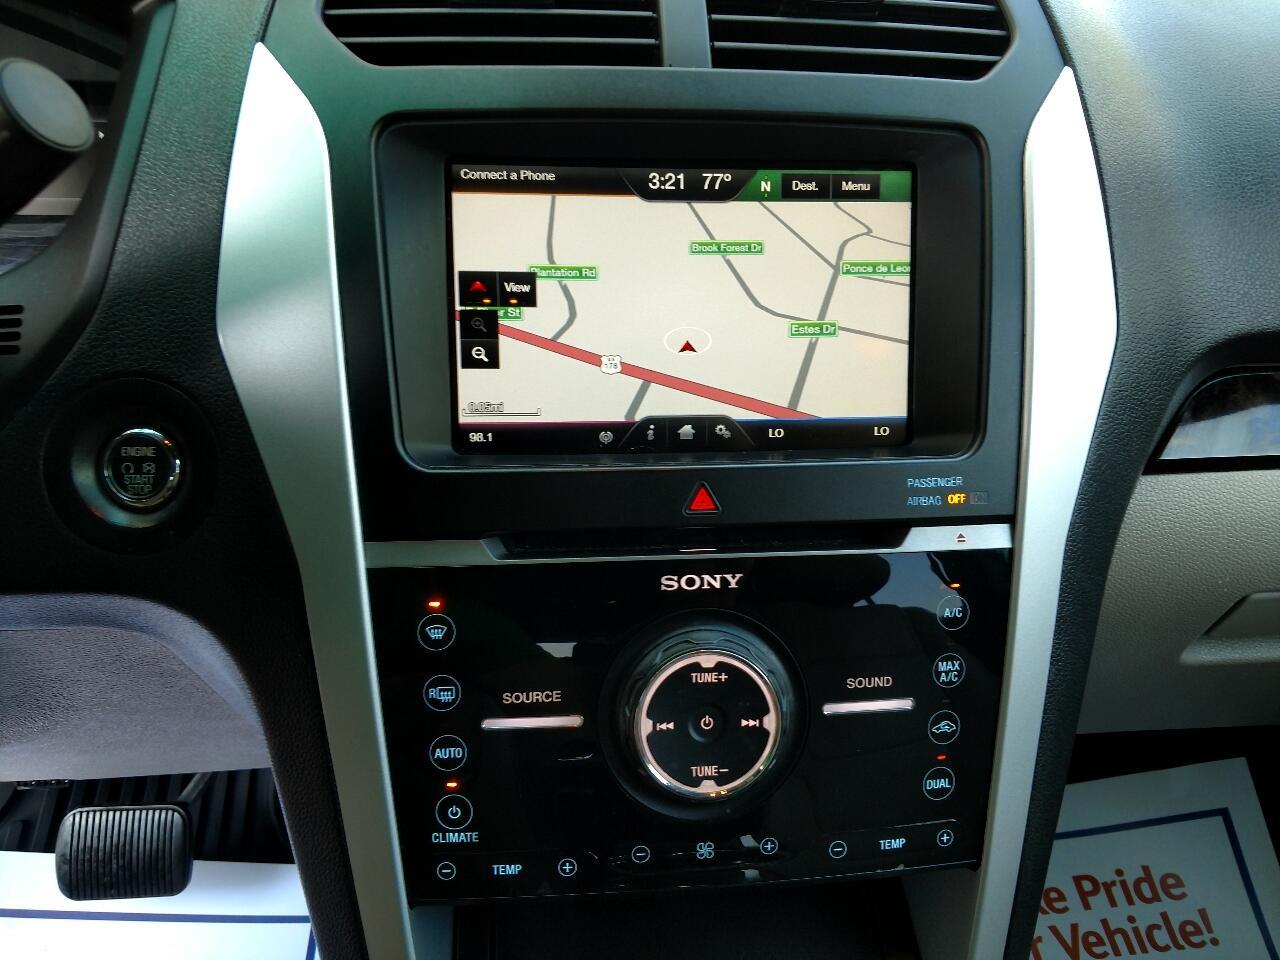 2012 Ford Explorer 4WD 4dr Limited